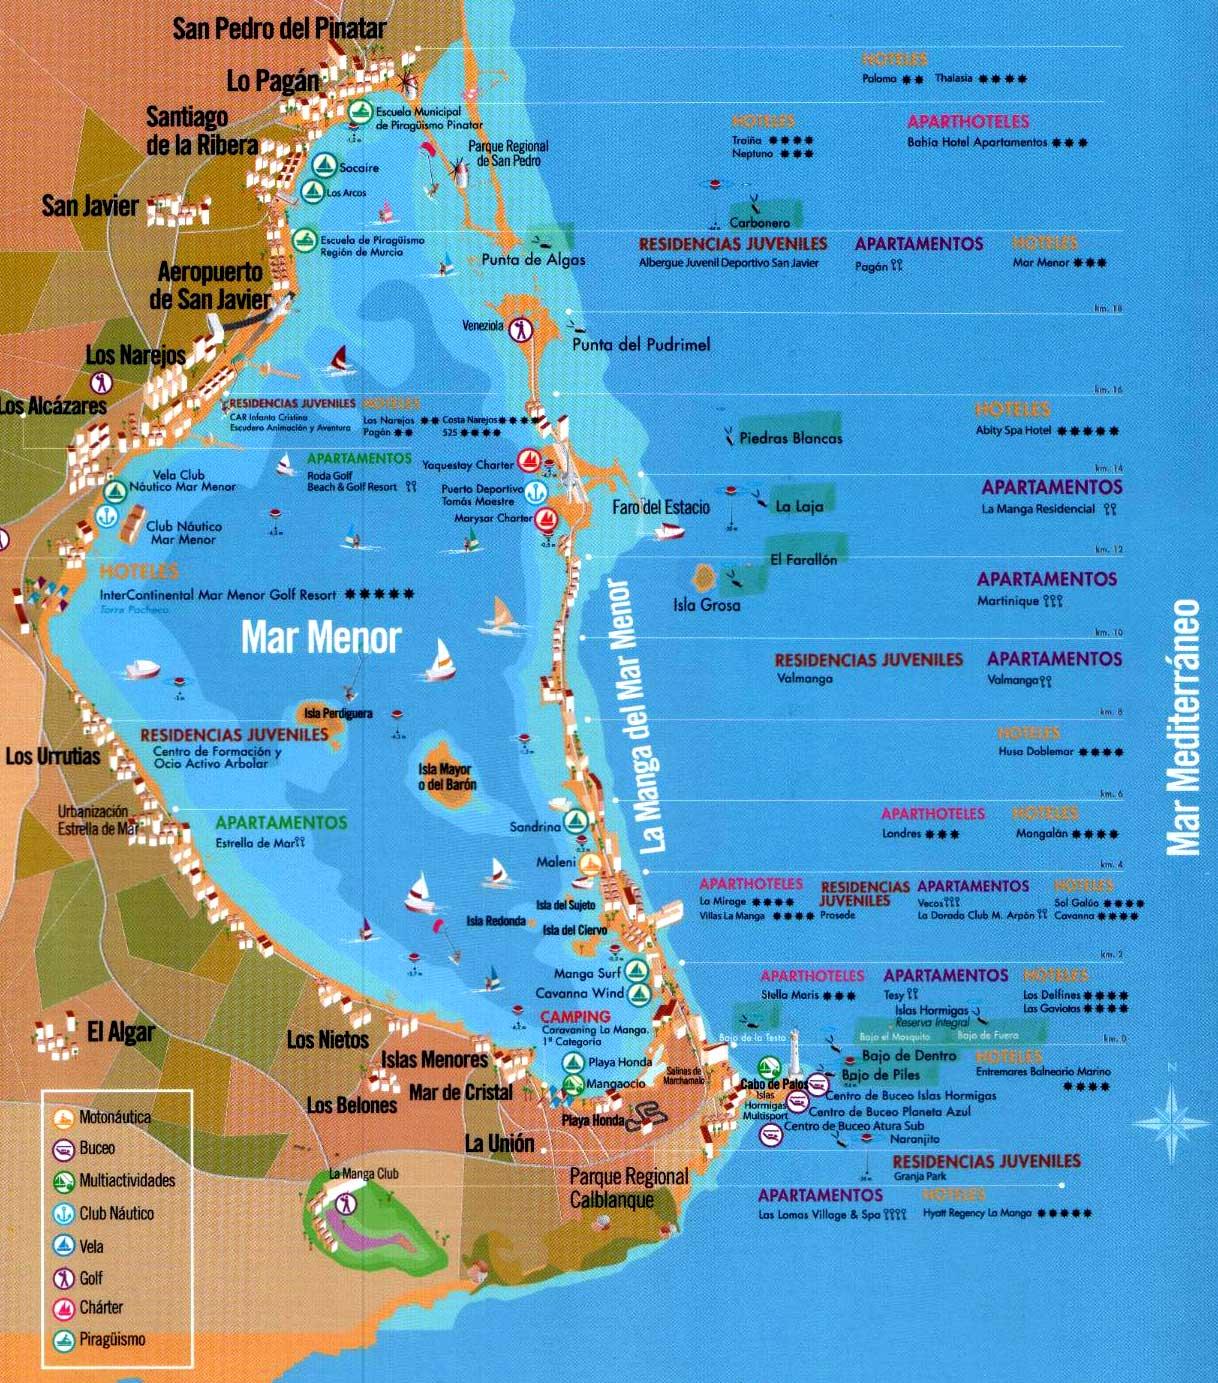 la manga del mar menor mapa Mapas del Mar Menor la manga del mar menor mapa